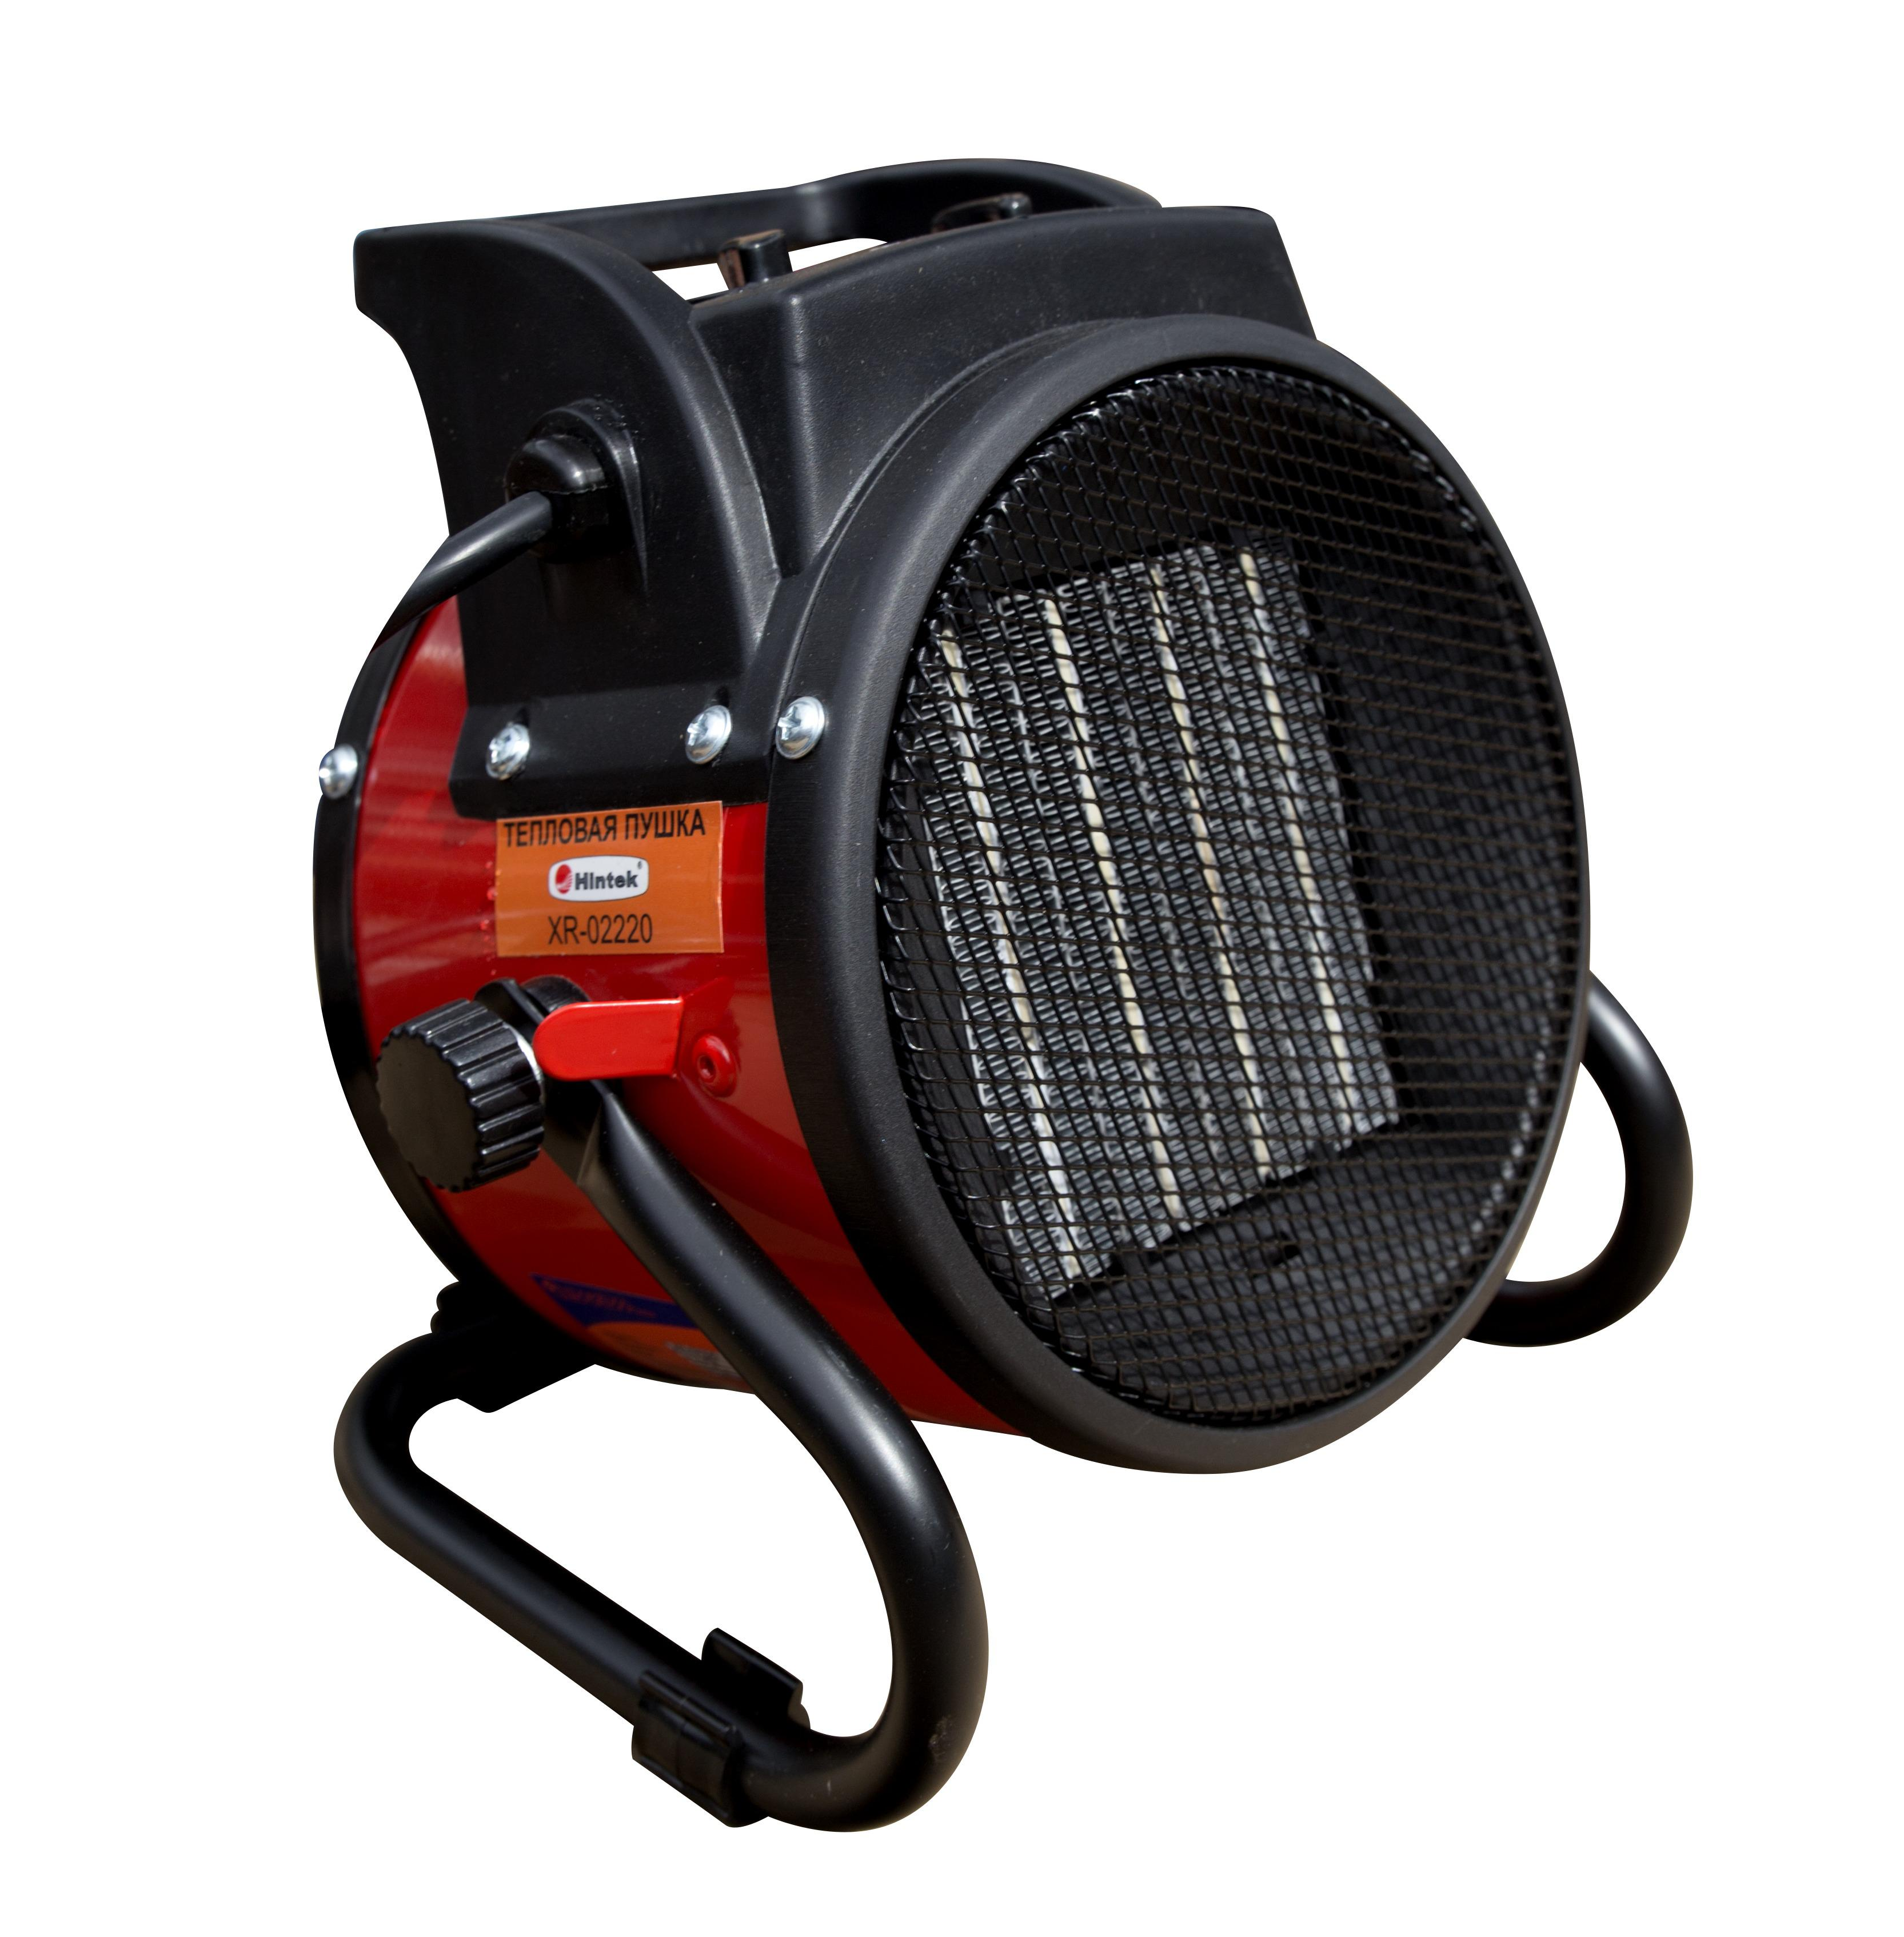 Тепловентилятор Hintek Xr-02220 цена 2017